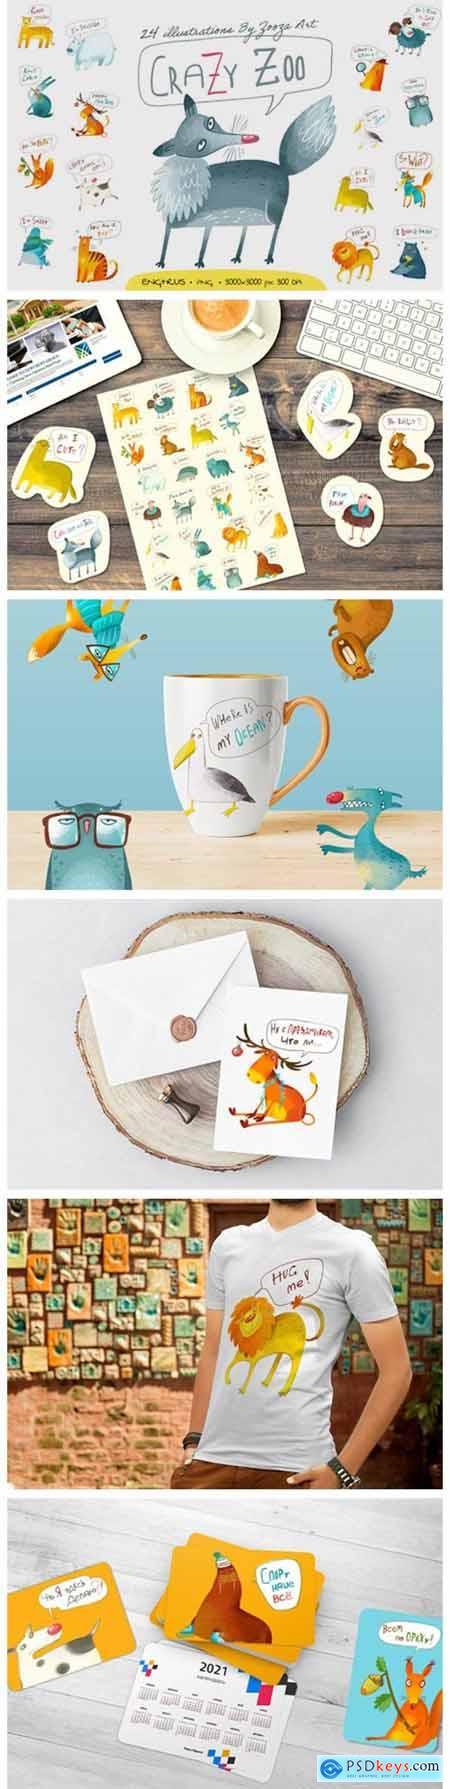 Crazy Zoo - Animals Illustrations 6822939